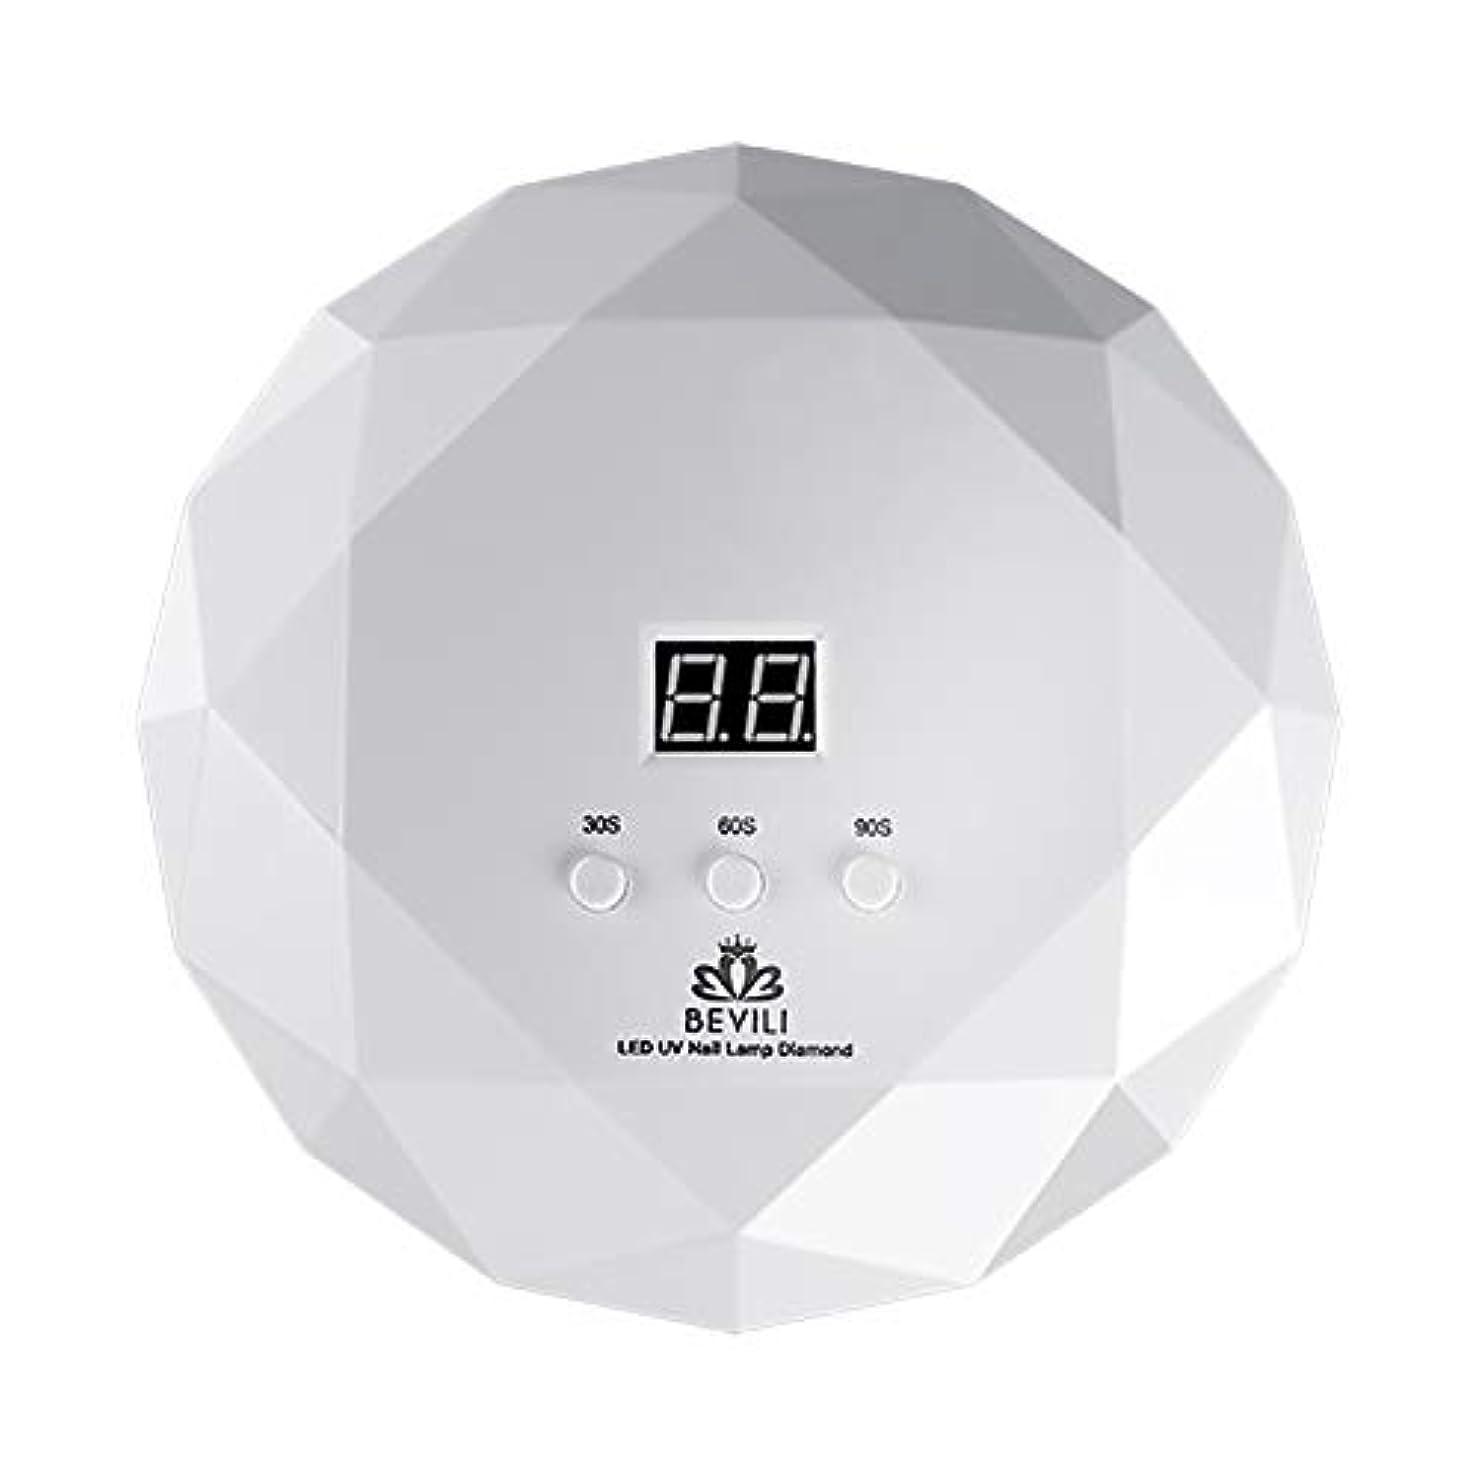 LITI LEDネイルドライヤー UVネイルライト 36Wハイパワー 自動センサー 3段階タイマー設定 高速硬化ジェルネイルライト UVとLEDダブルライト肌をケア ジェルネイル用 ホワイト